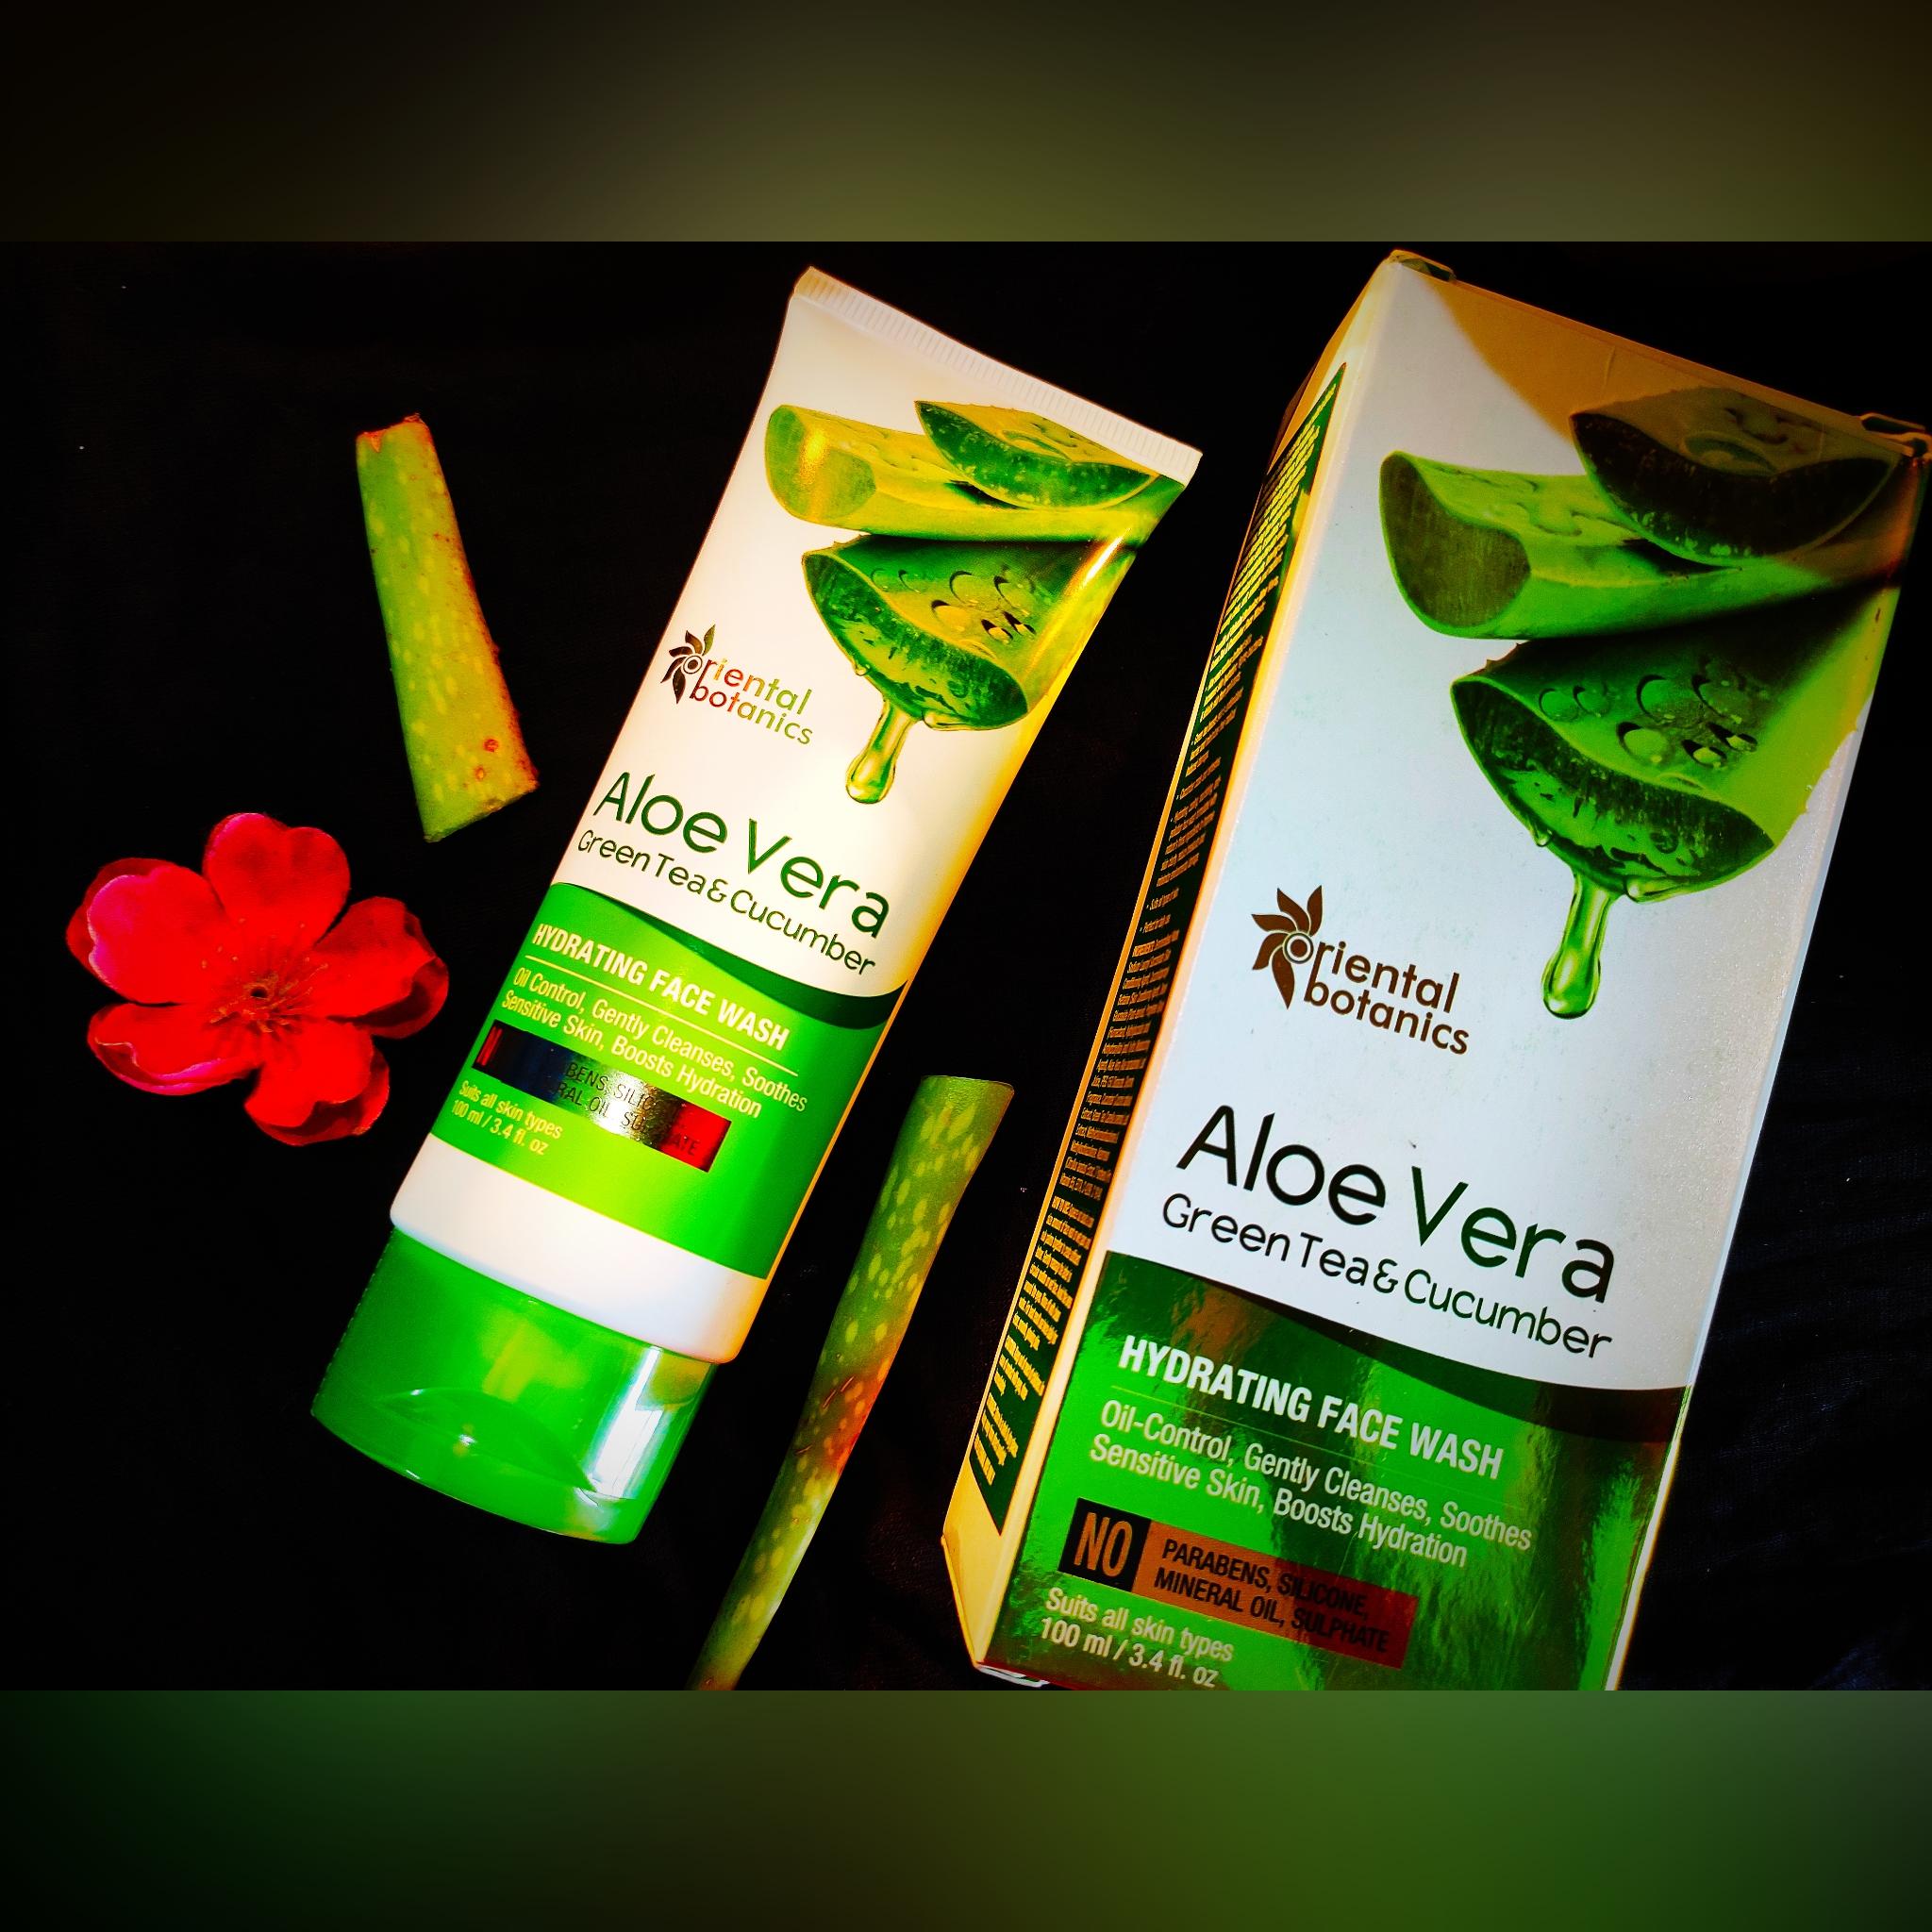 Oriental Botanics Aloe Vera, Green Tea & Cucumber Hydrating Face Wash-Amazing Hydrating Face Wash-By megha_dhar